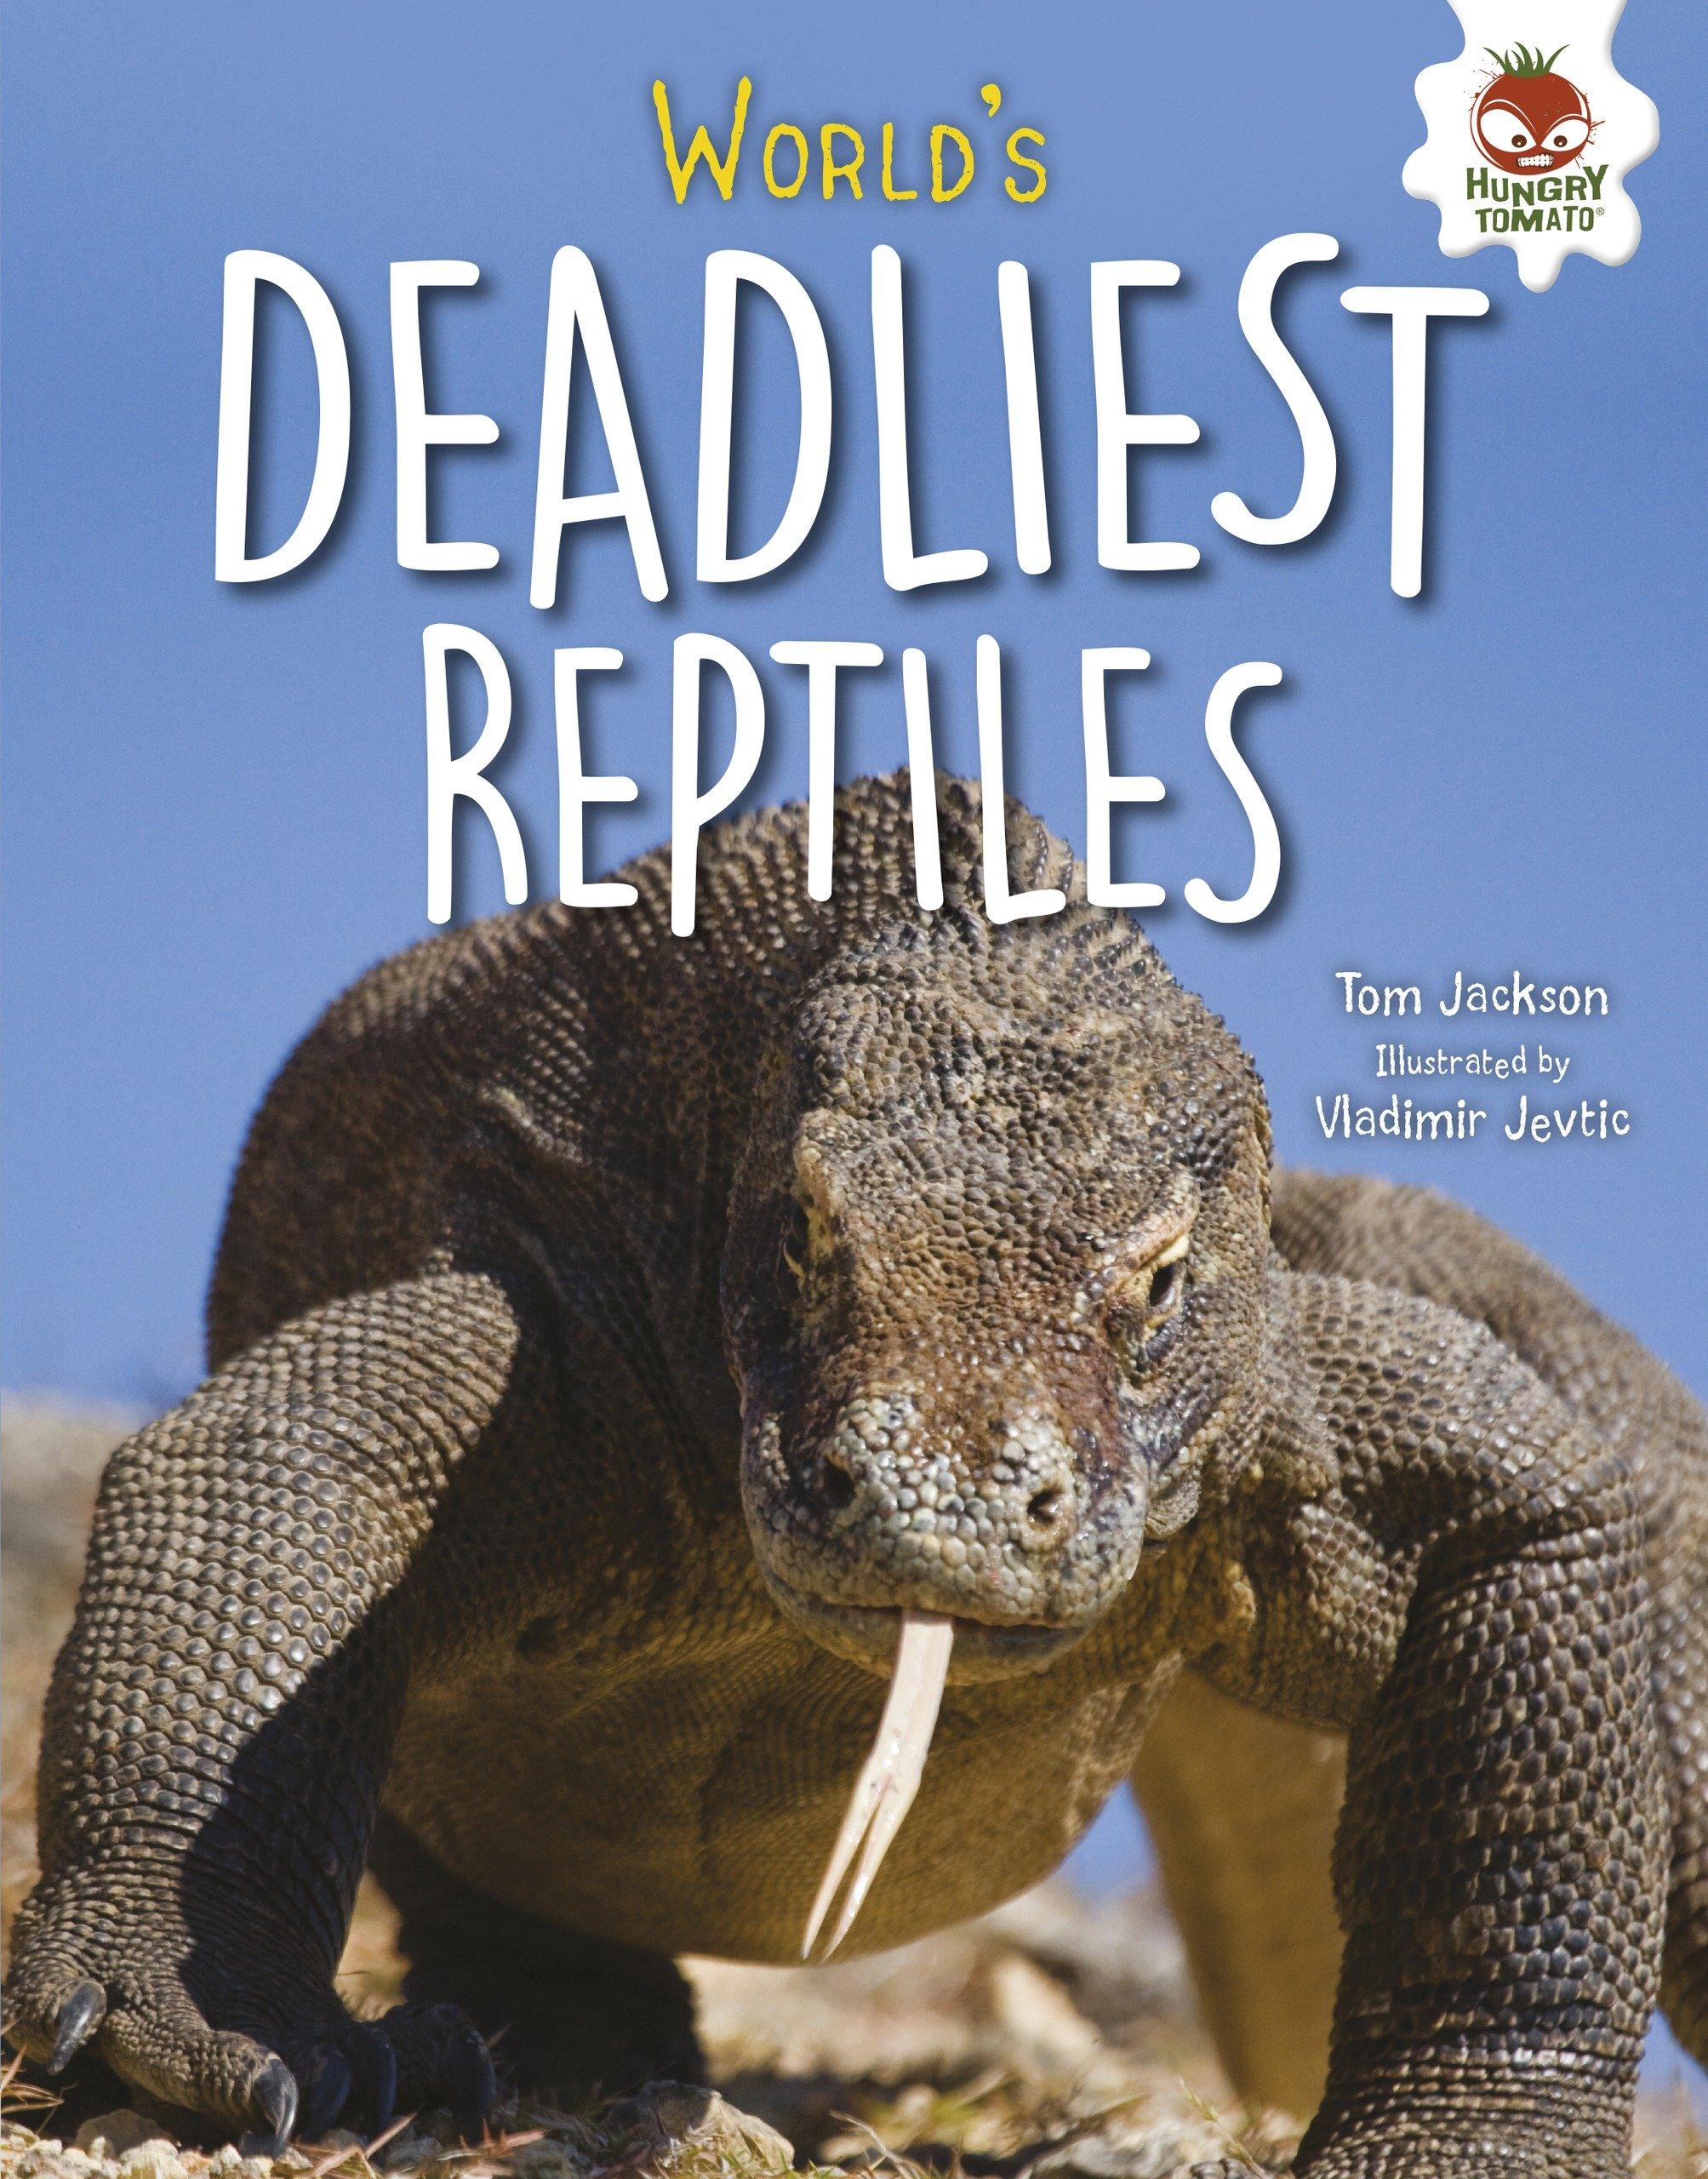 World's Deadliest Reptiles (Extreme Reptiles)